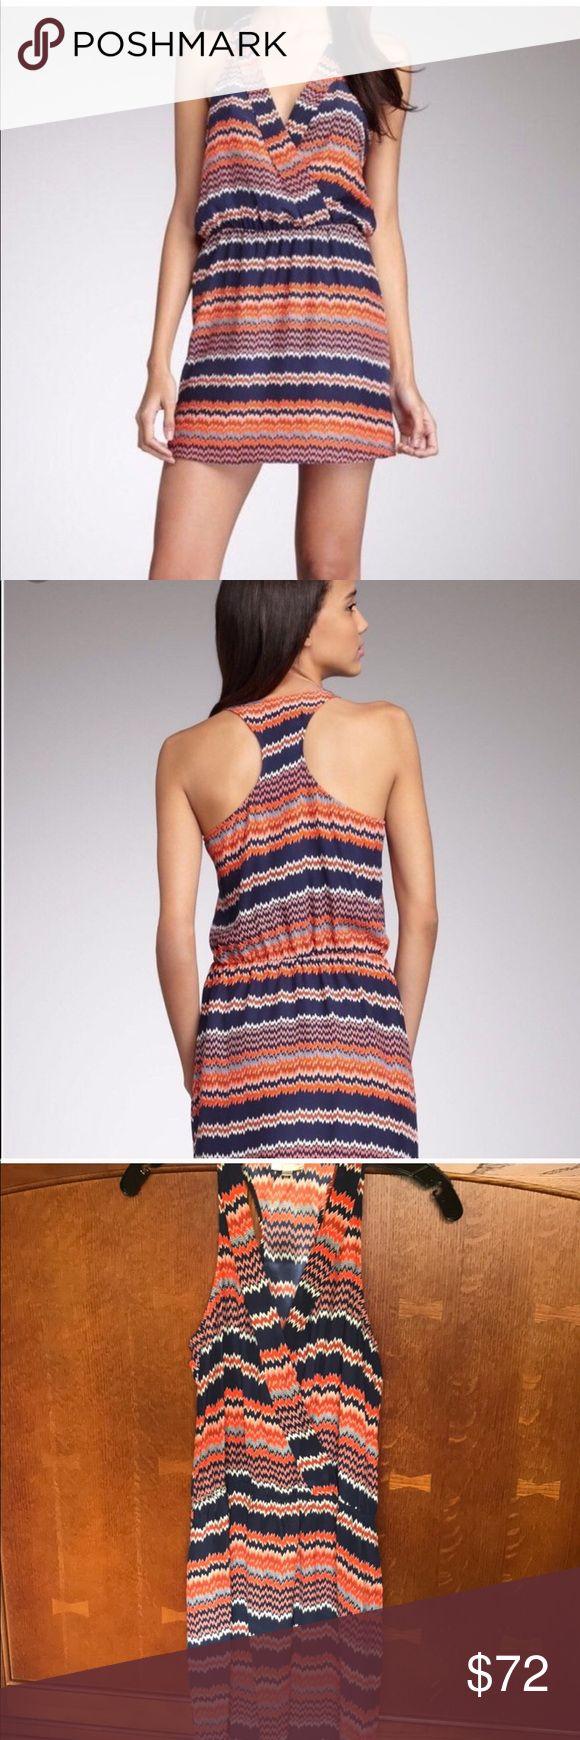 Blue and Orange Parker chevron dress 100% silk Parker dress. Blue and orange chevron print. Elastic waist. Parker Dresses